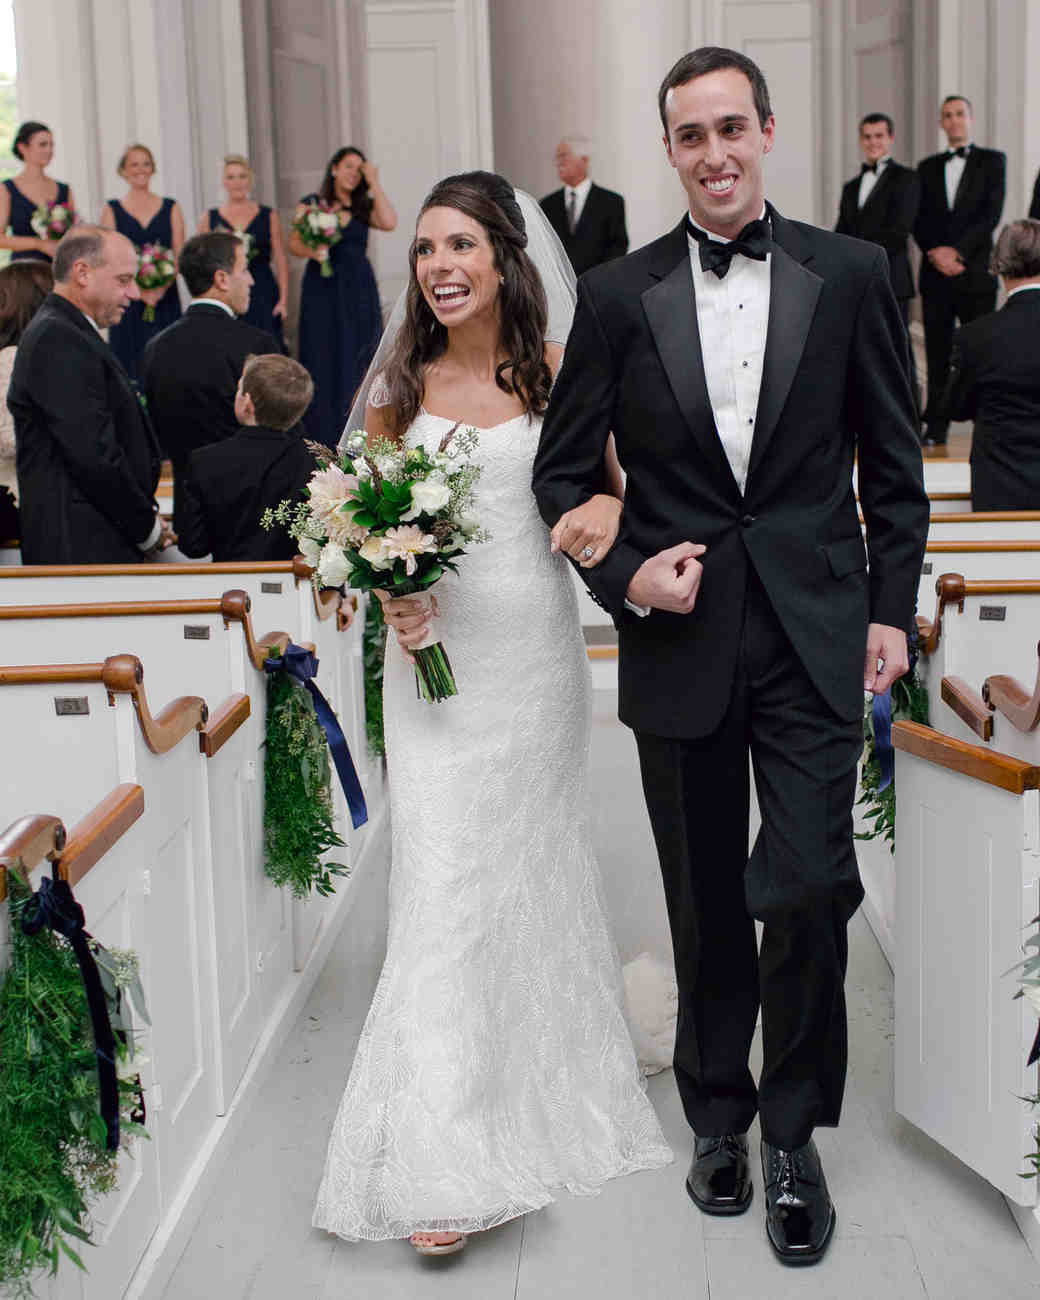 lindsay-garrett-wedding-recessional-0545-s111850-0415.jpg